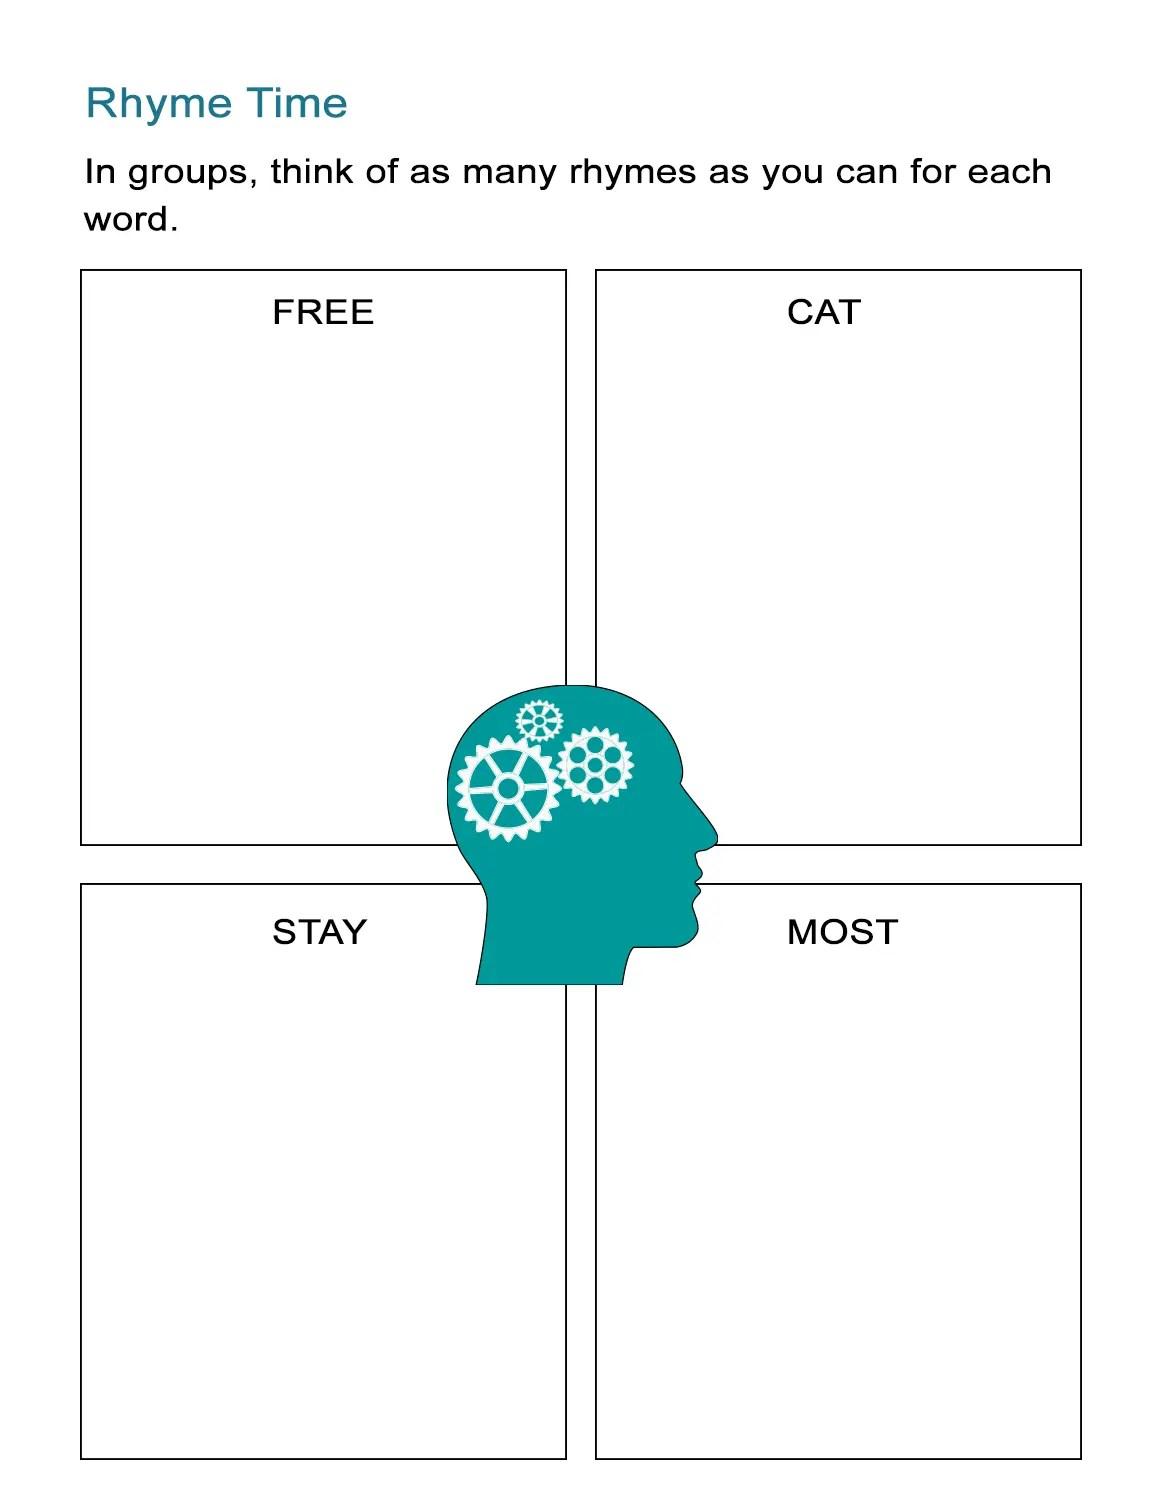 Rhyme Time Activity Sheet Rhymes List Brainstorming